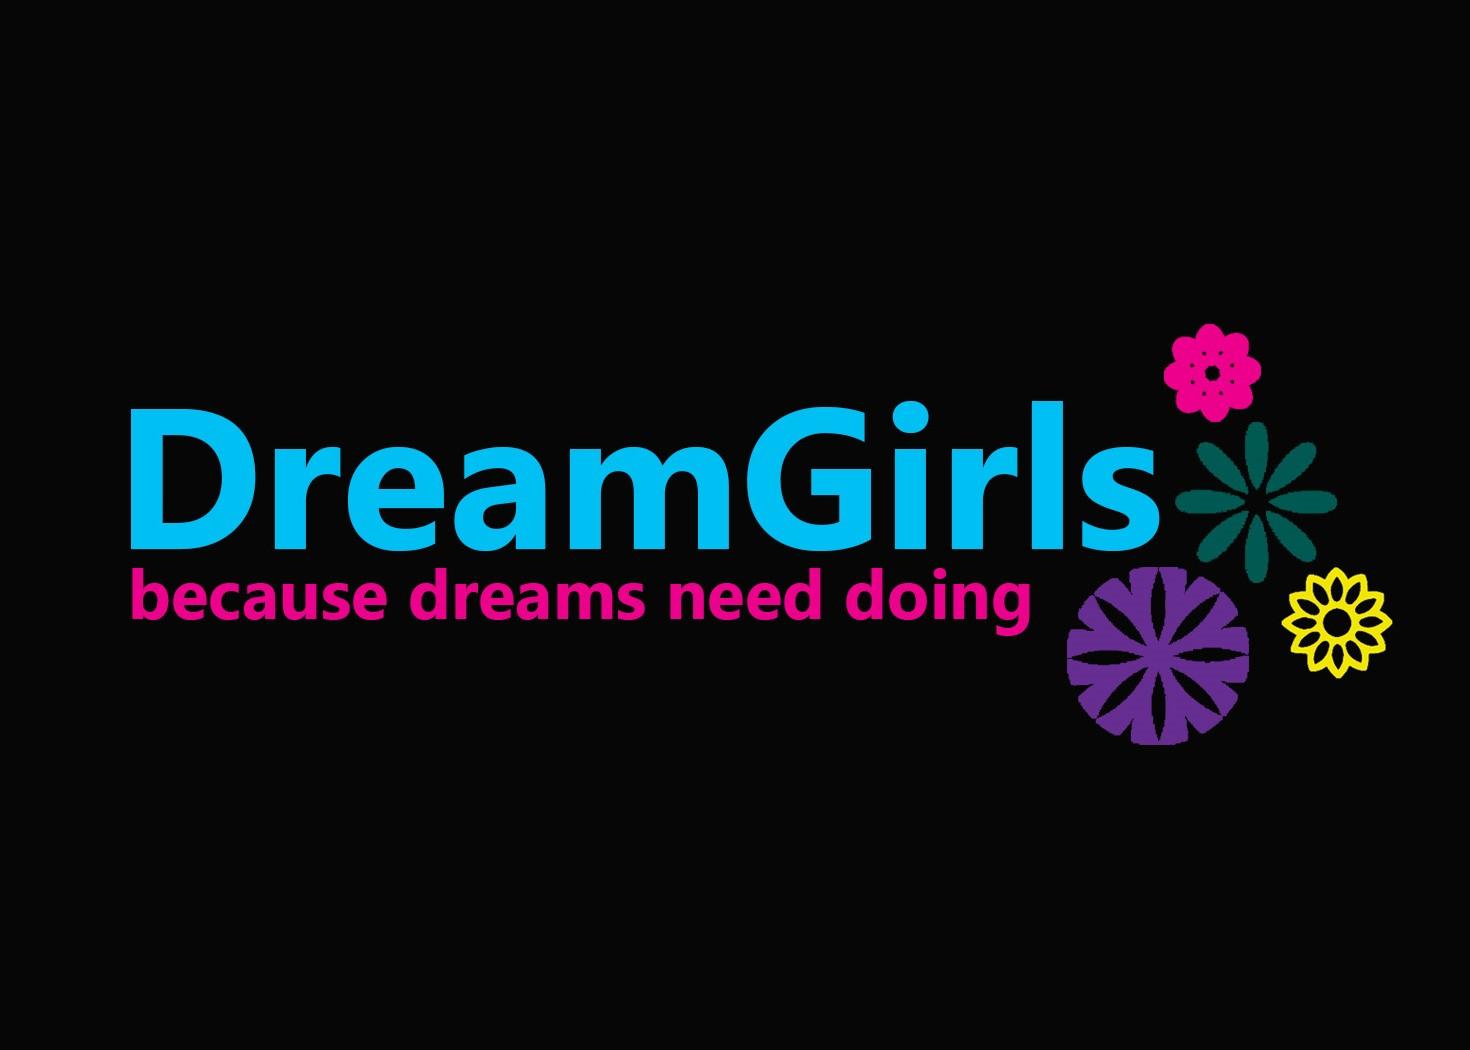 4e6688baec975096465a_DreamGirls_Logo_black__2_.jpg